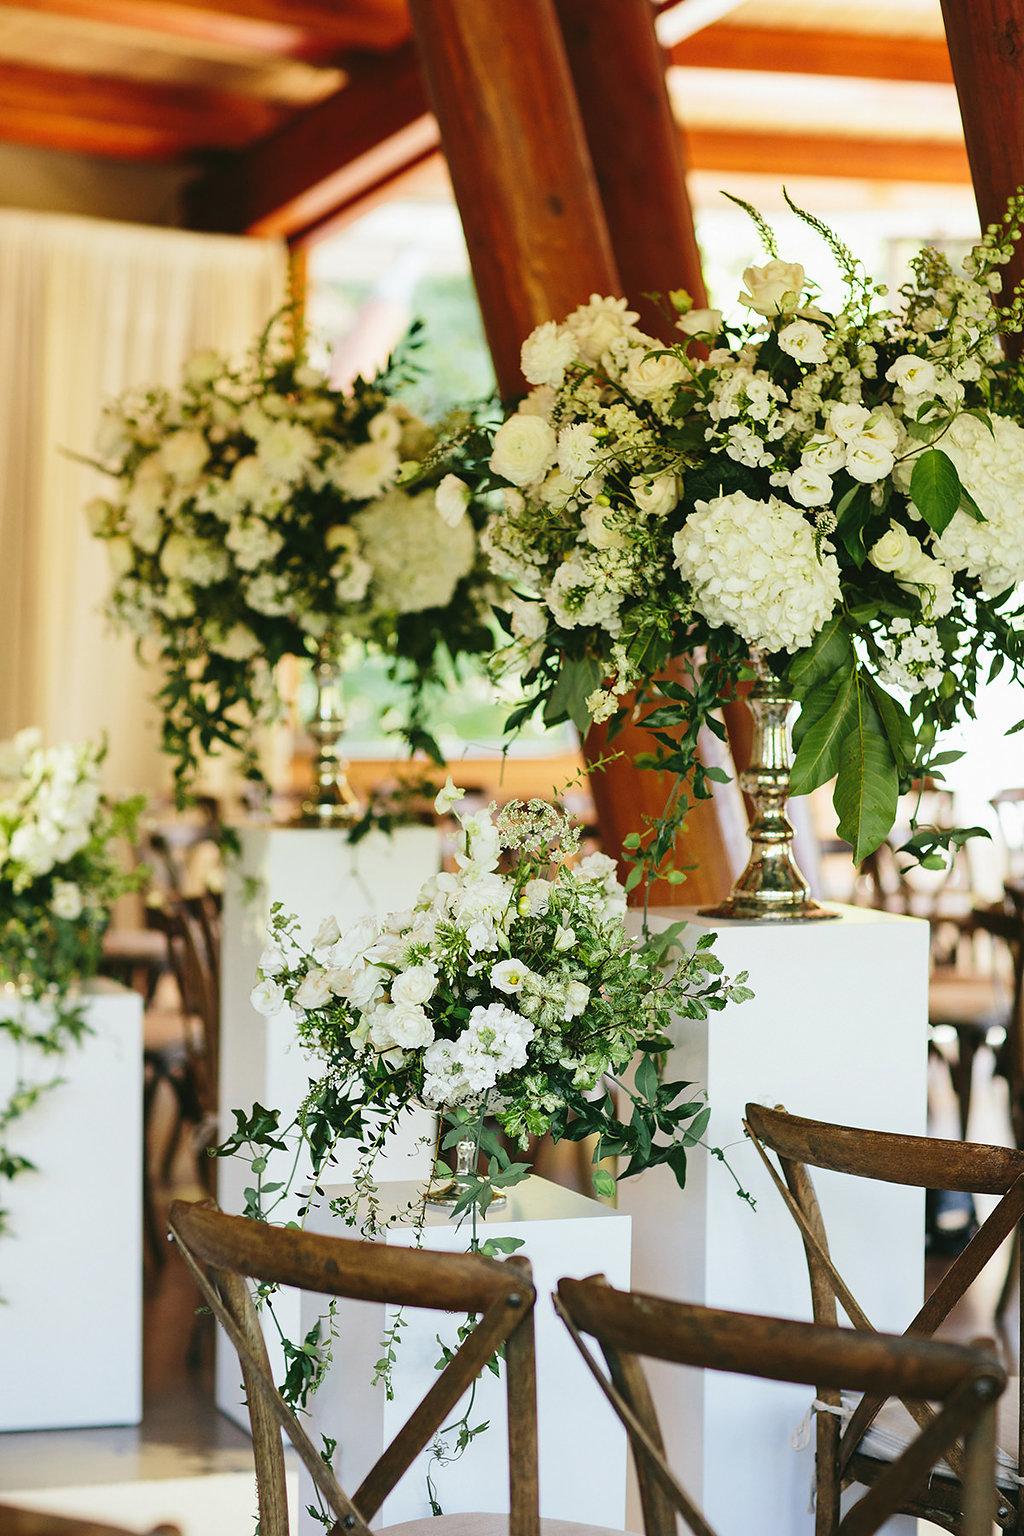 floral inspiration - photo by Melia Lucida http://ruffledblog.com/elegant-canadian-wedding-with-greenery